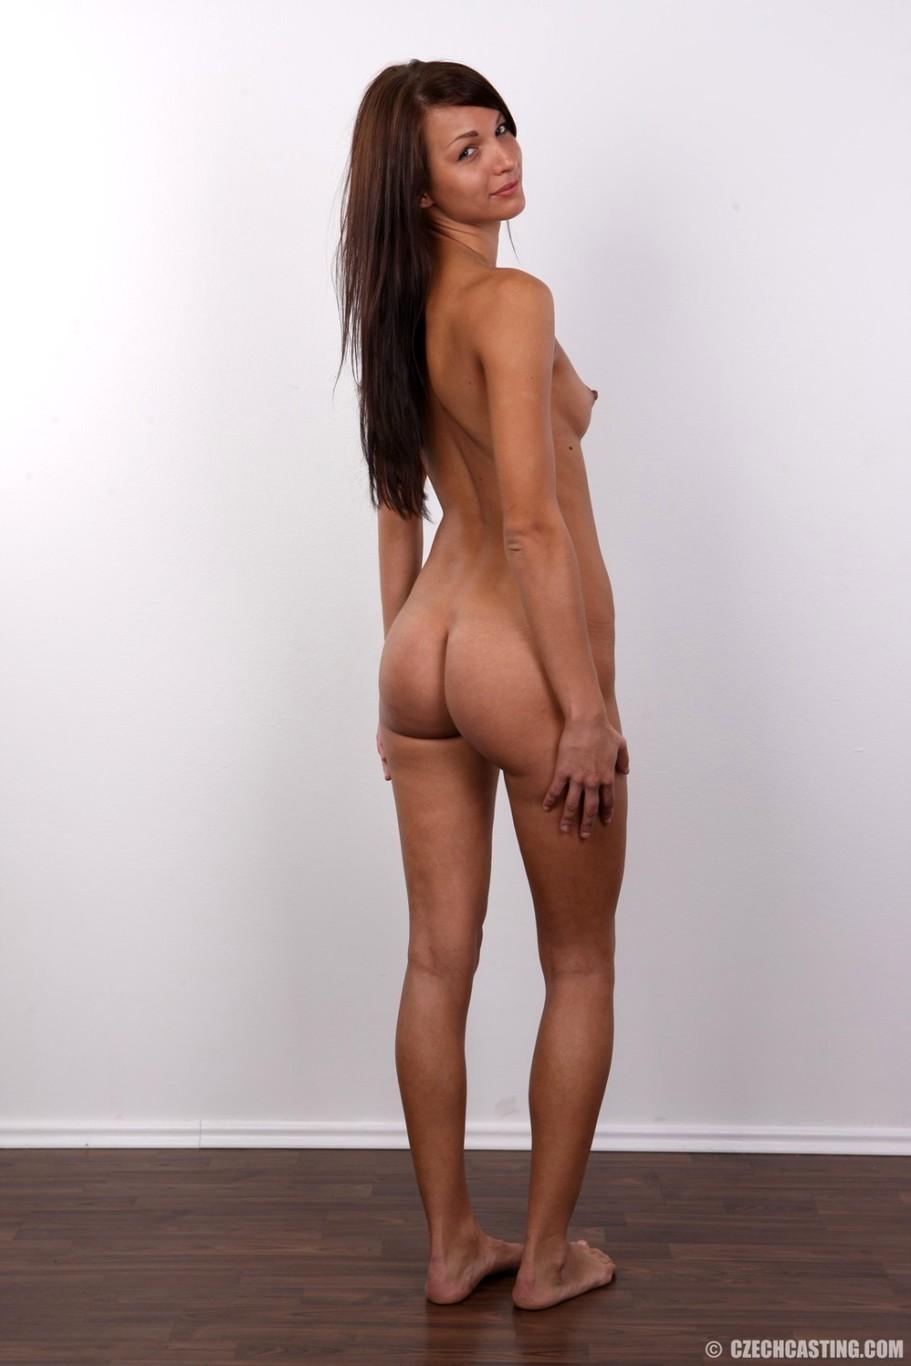 Casting brunette czech